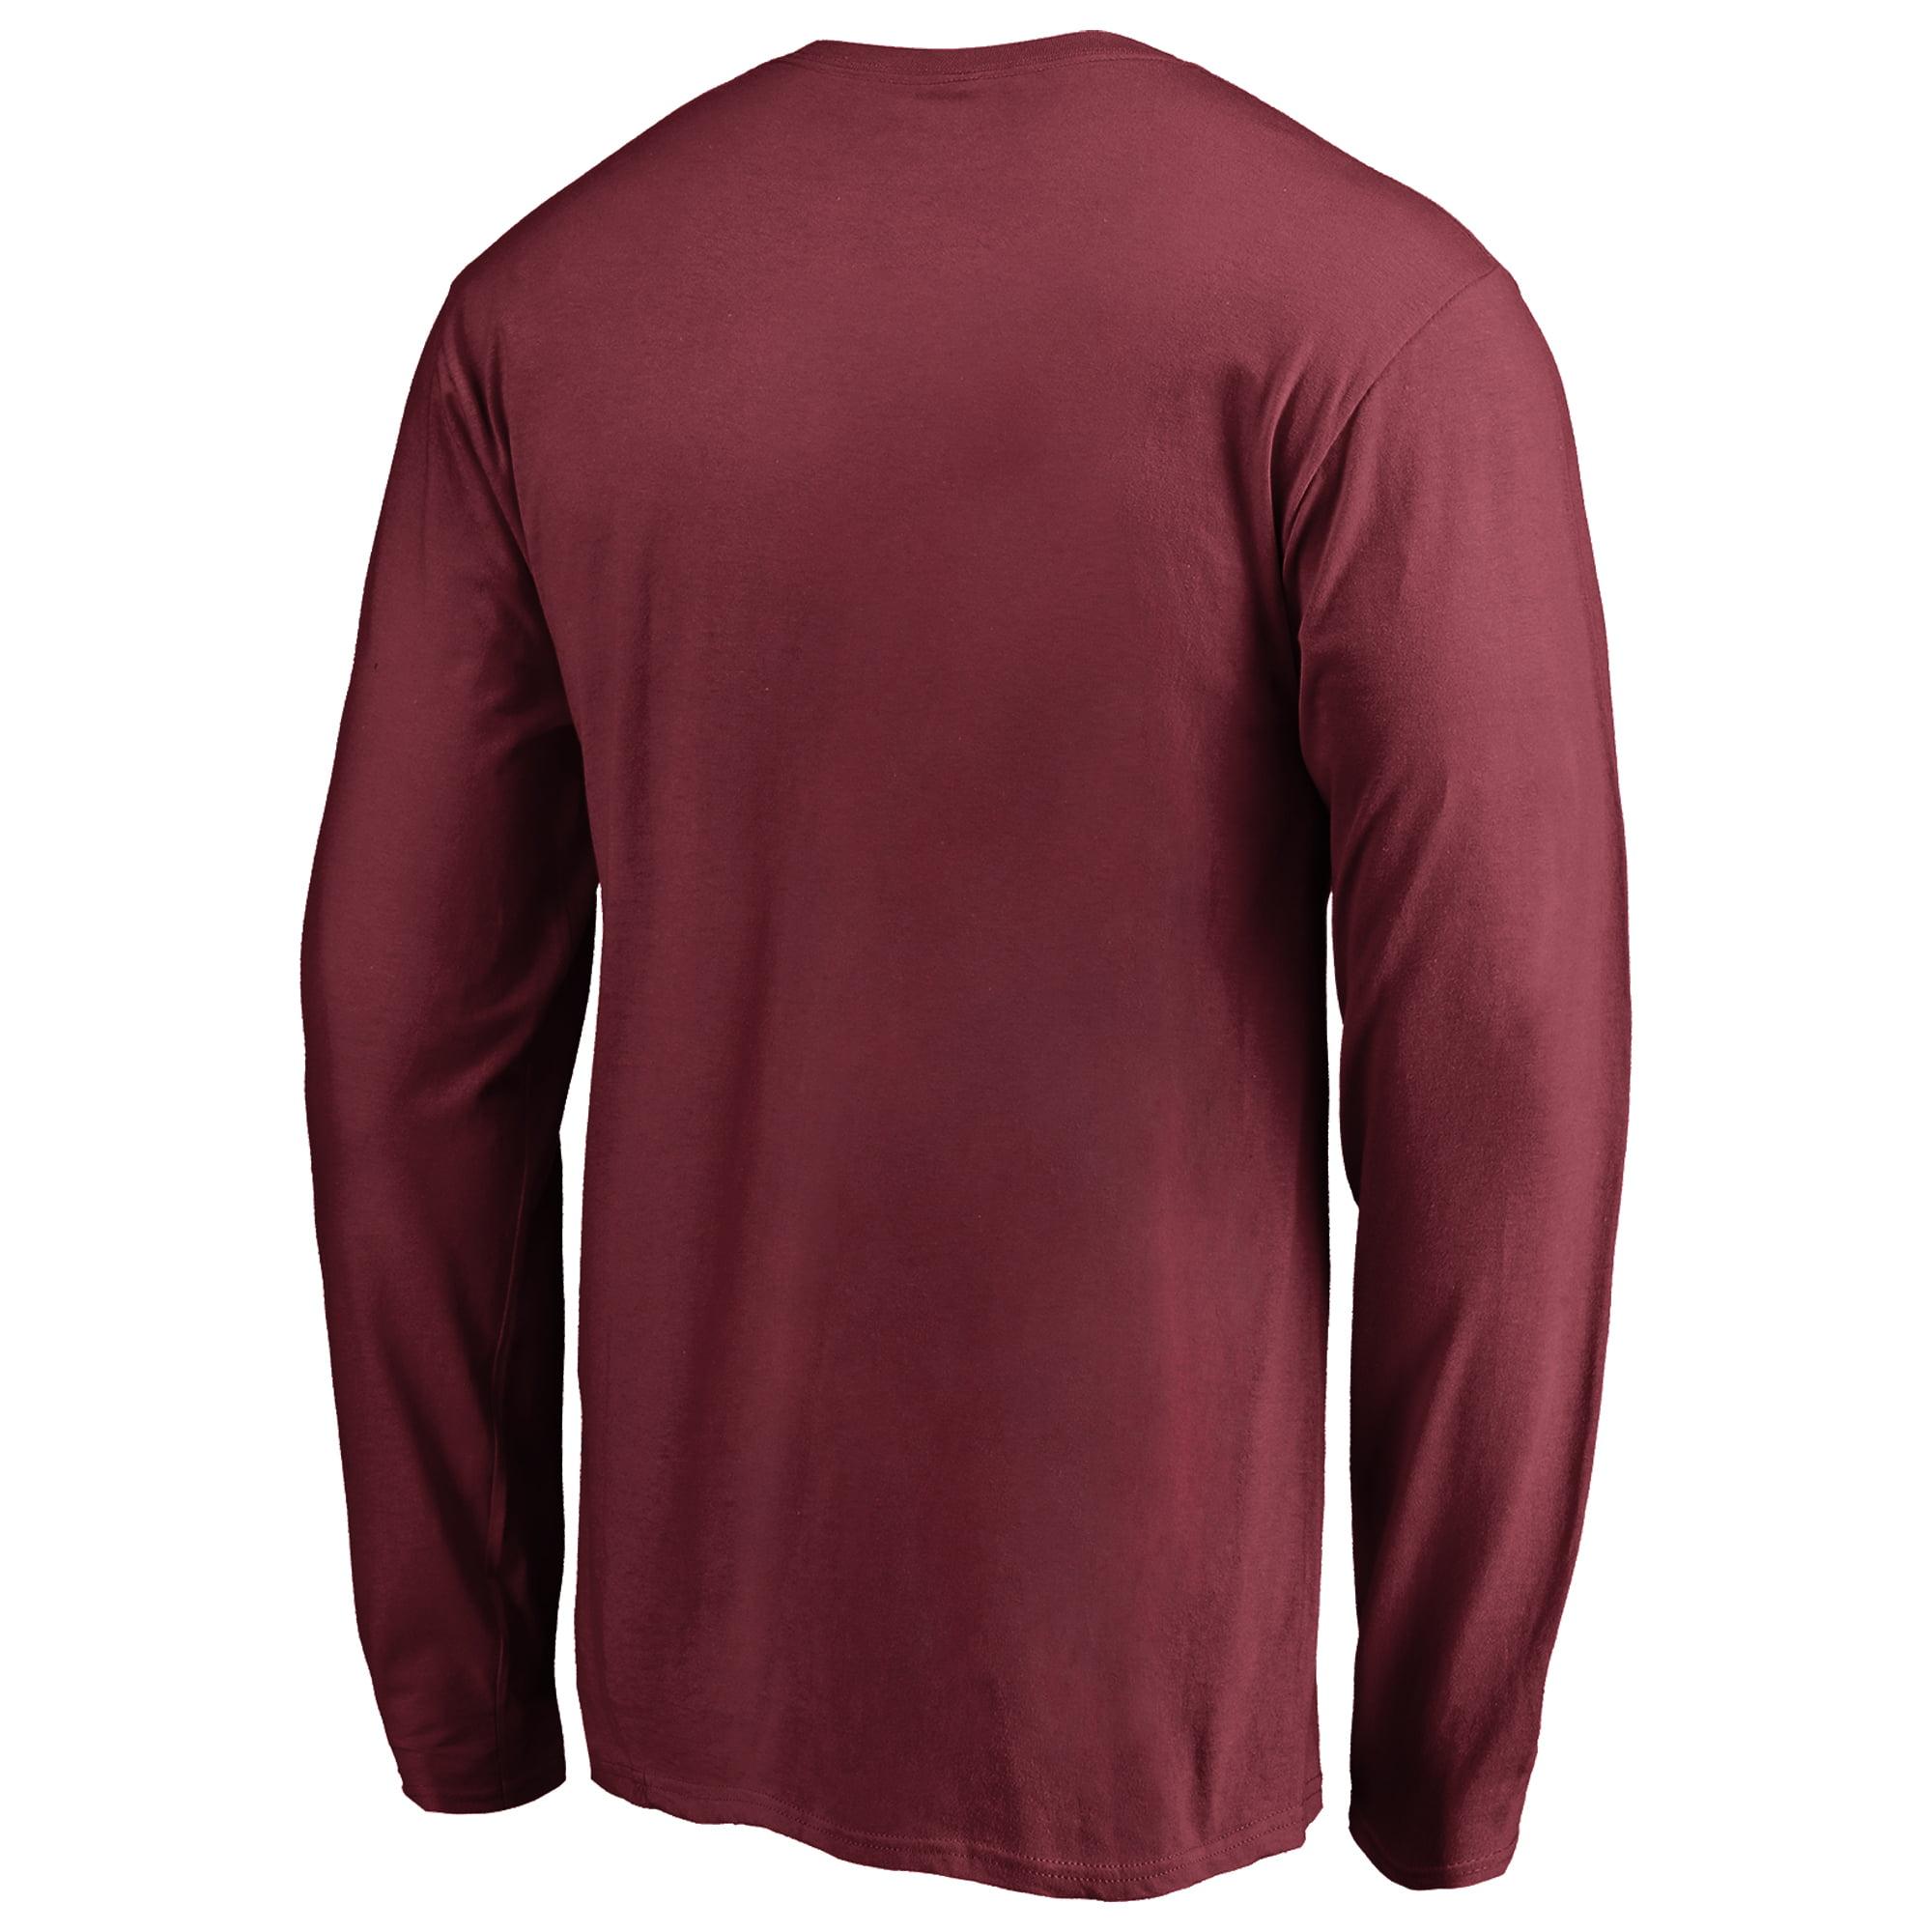 791c11fefc9 Boston College Eagles Fanatics Branded Campus Icon Long Sleeve T-Shirt -  Maroon - Walmart.com